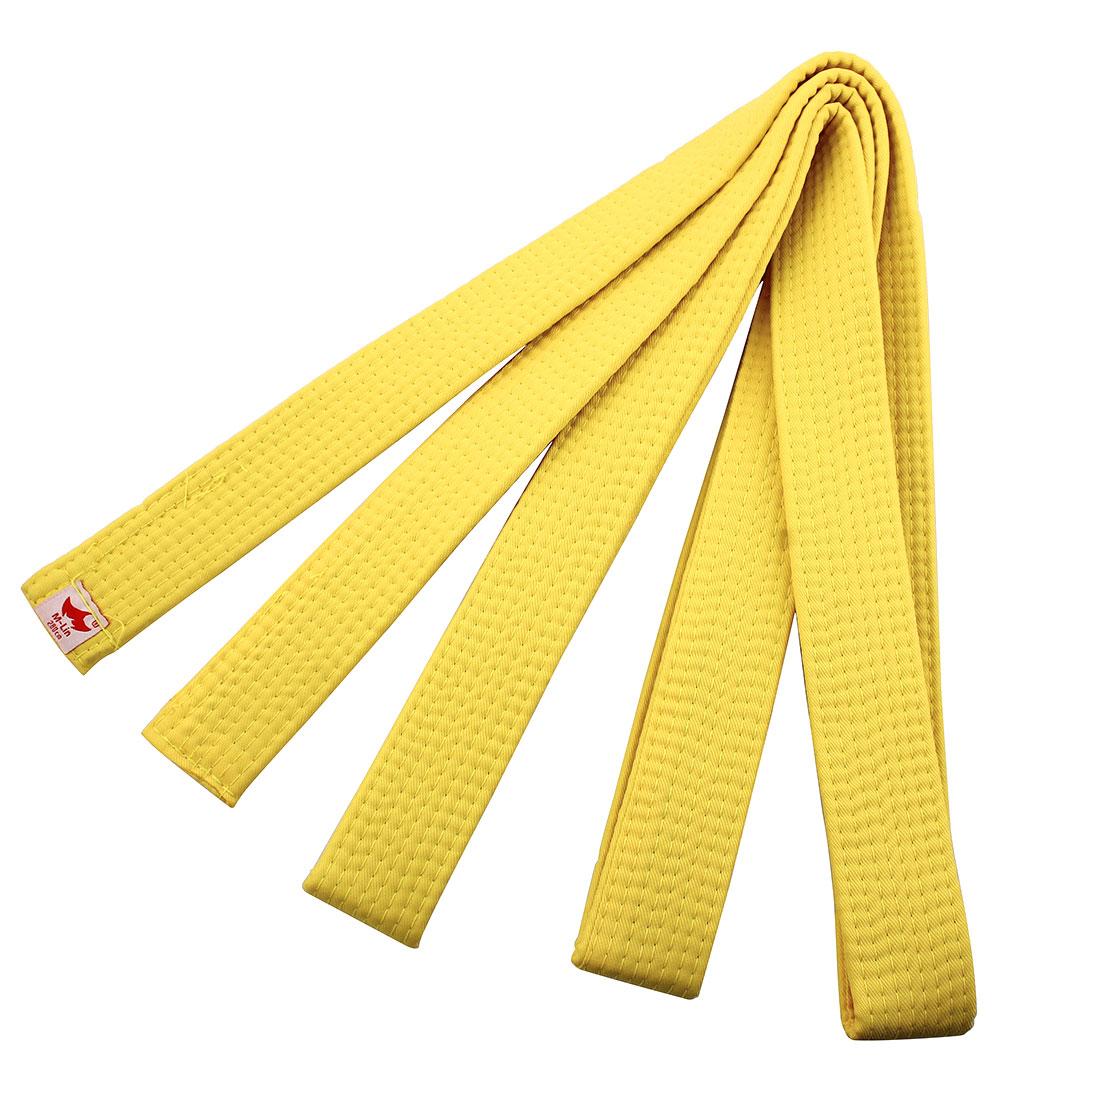 Martial Arts Band Kendo Karate Wrap Taekwondo Uniform Belt Yellow 280cm Length